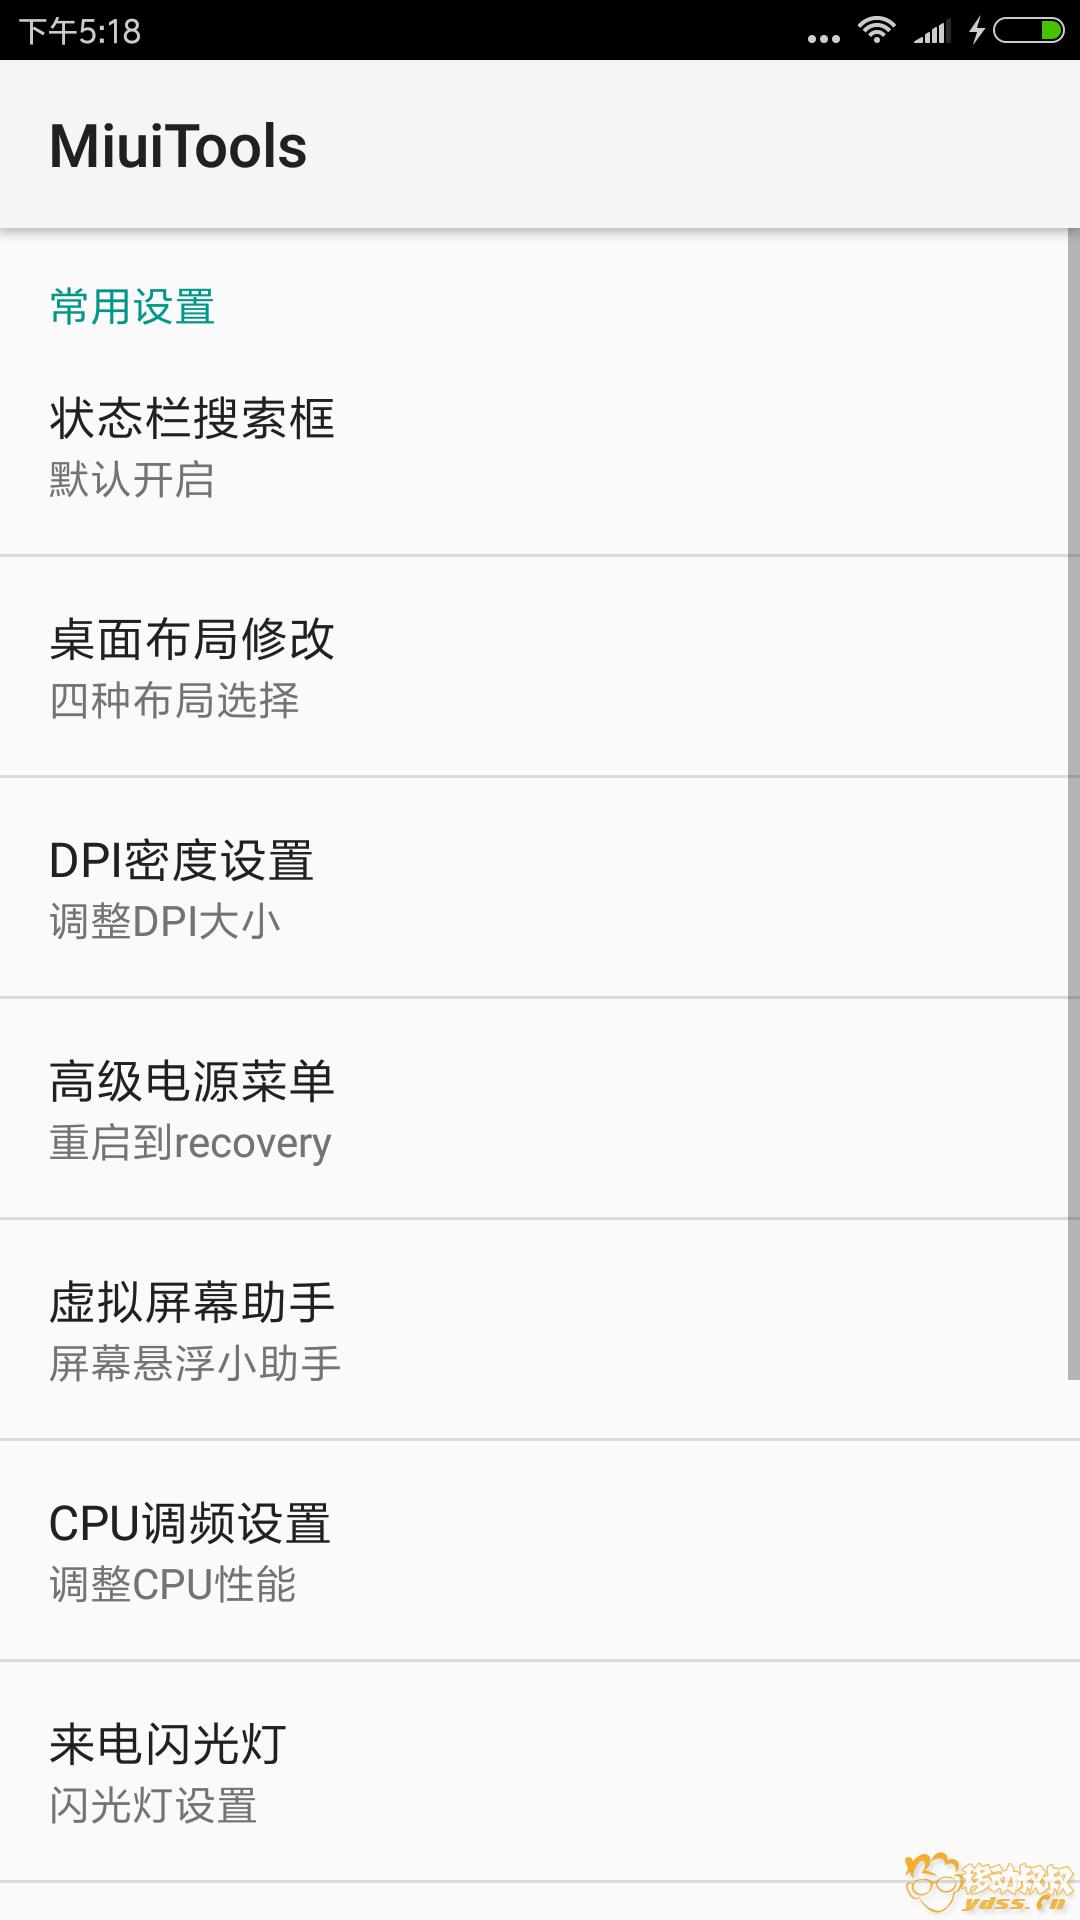 Screenshot_2018-04-15-17-18-59-220_com.anzhi.hwsettings.png